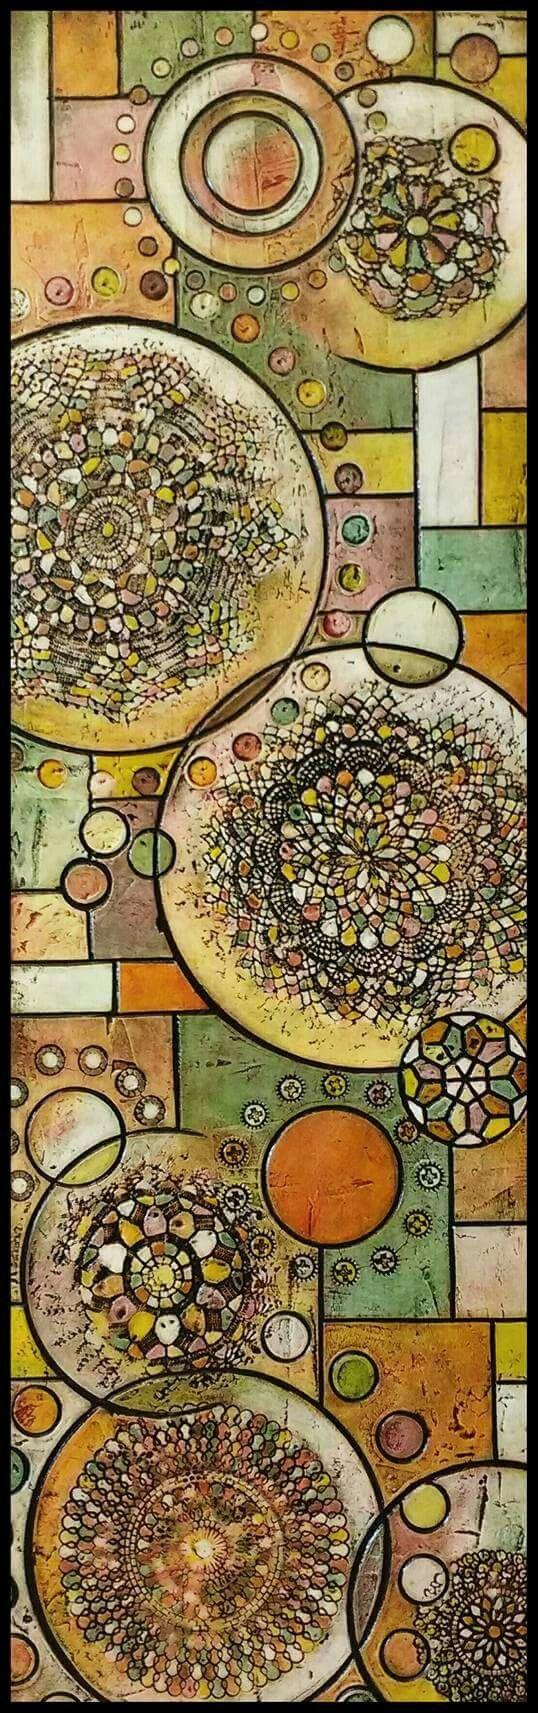 Abundance by Brenda Patel